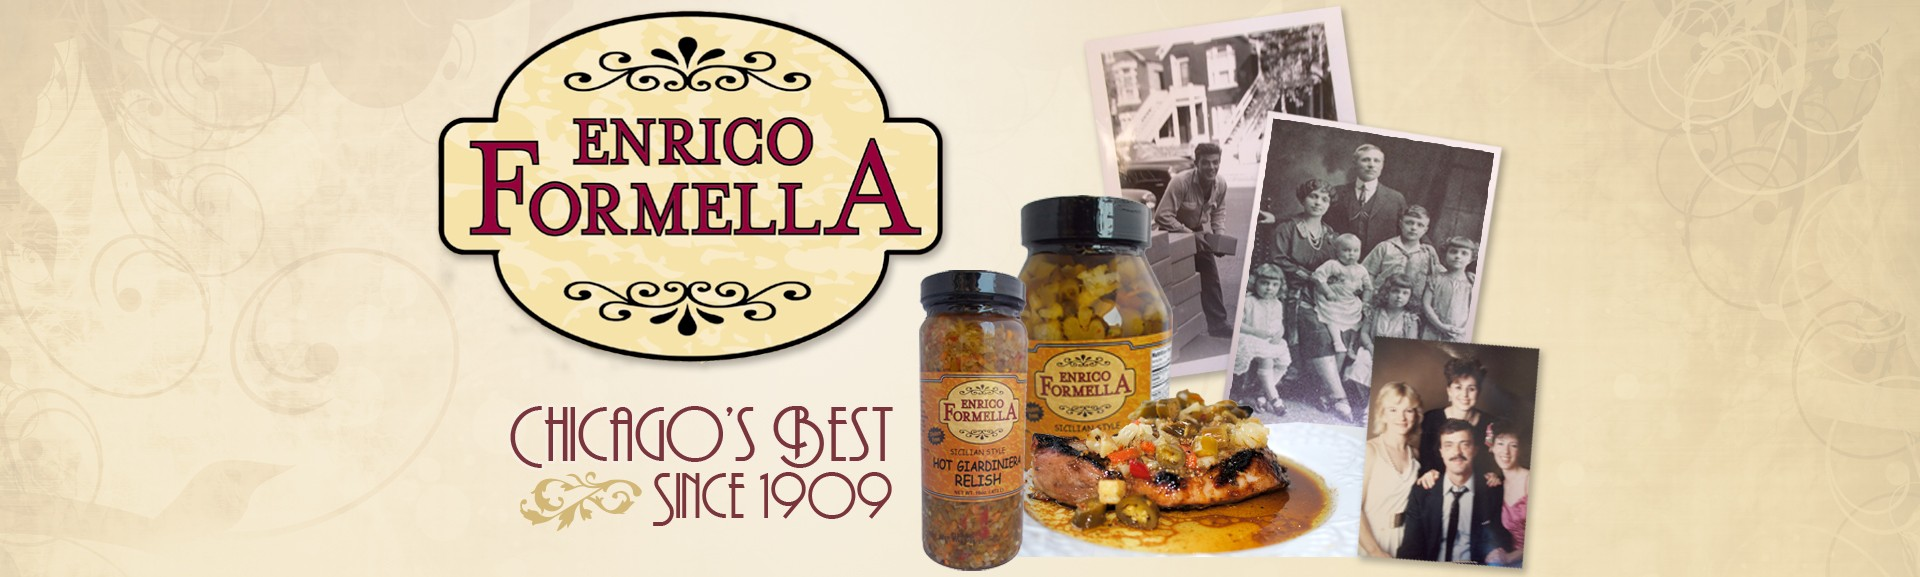 Enrico Formella: Chicago's Best since 1909